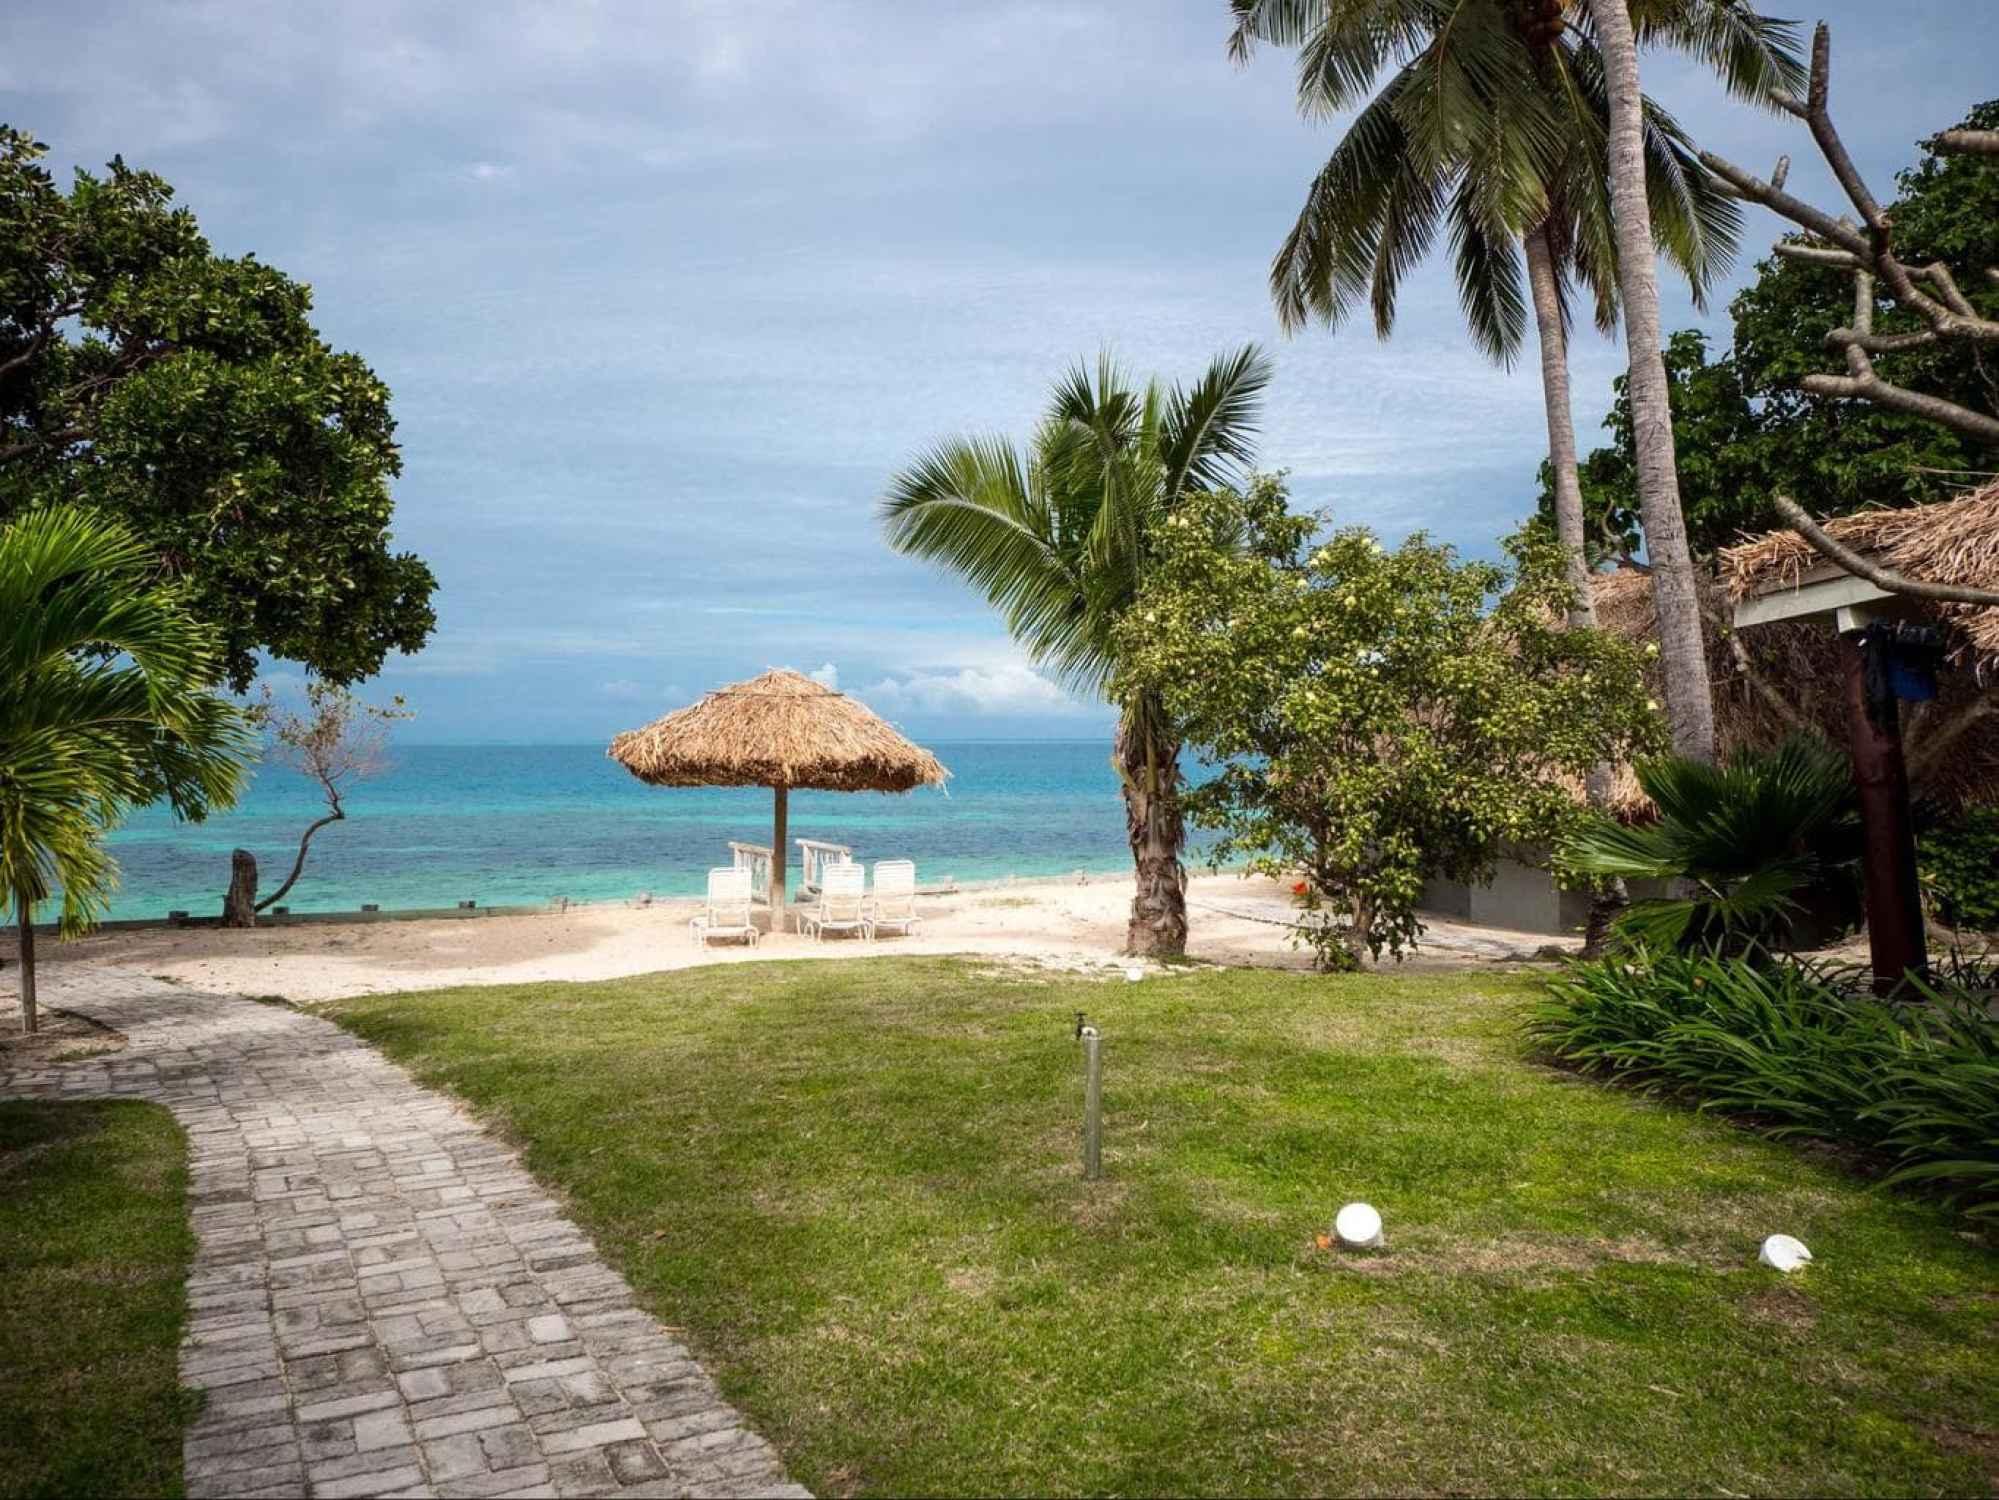 Hammocks and beach loungers across Castaway Island